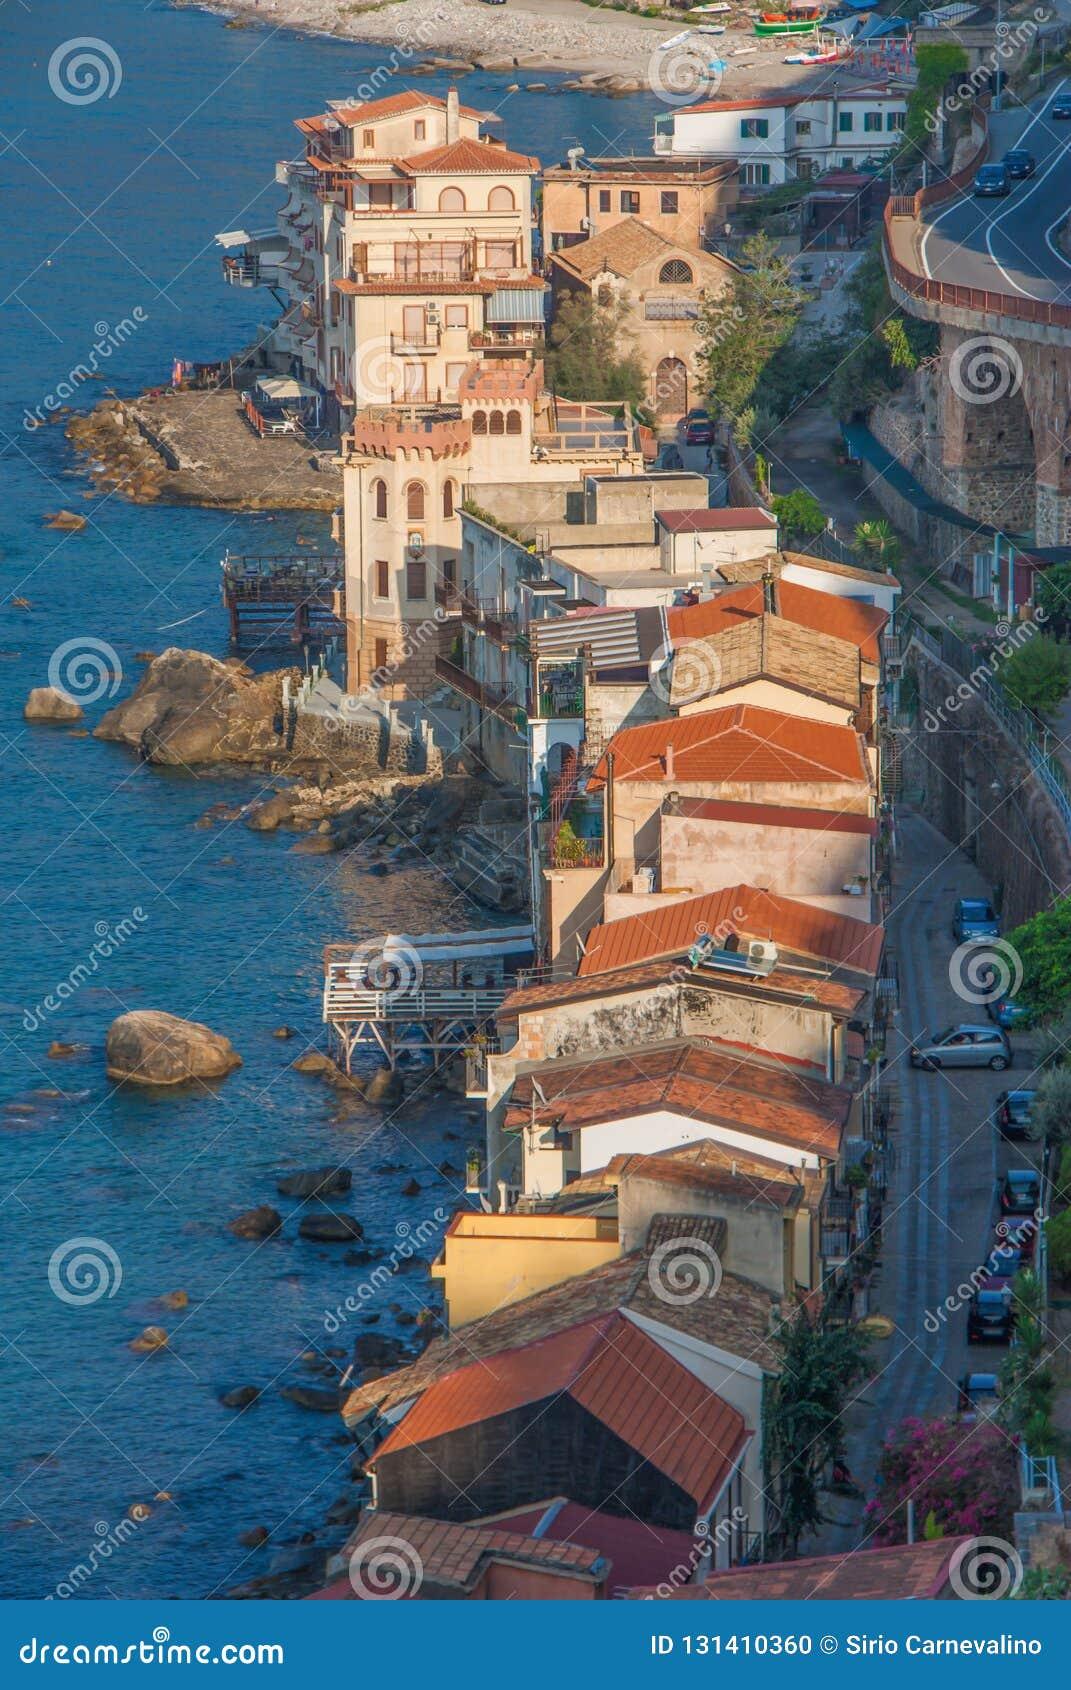 The beautiful seaside village of Scilla, Italy